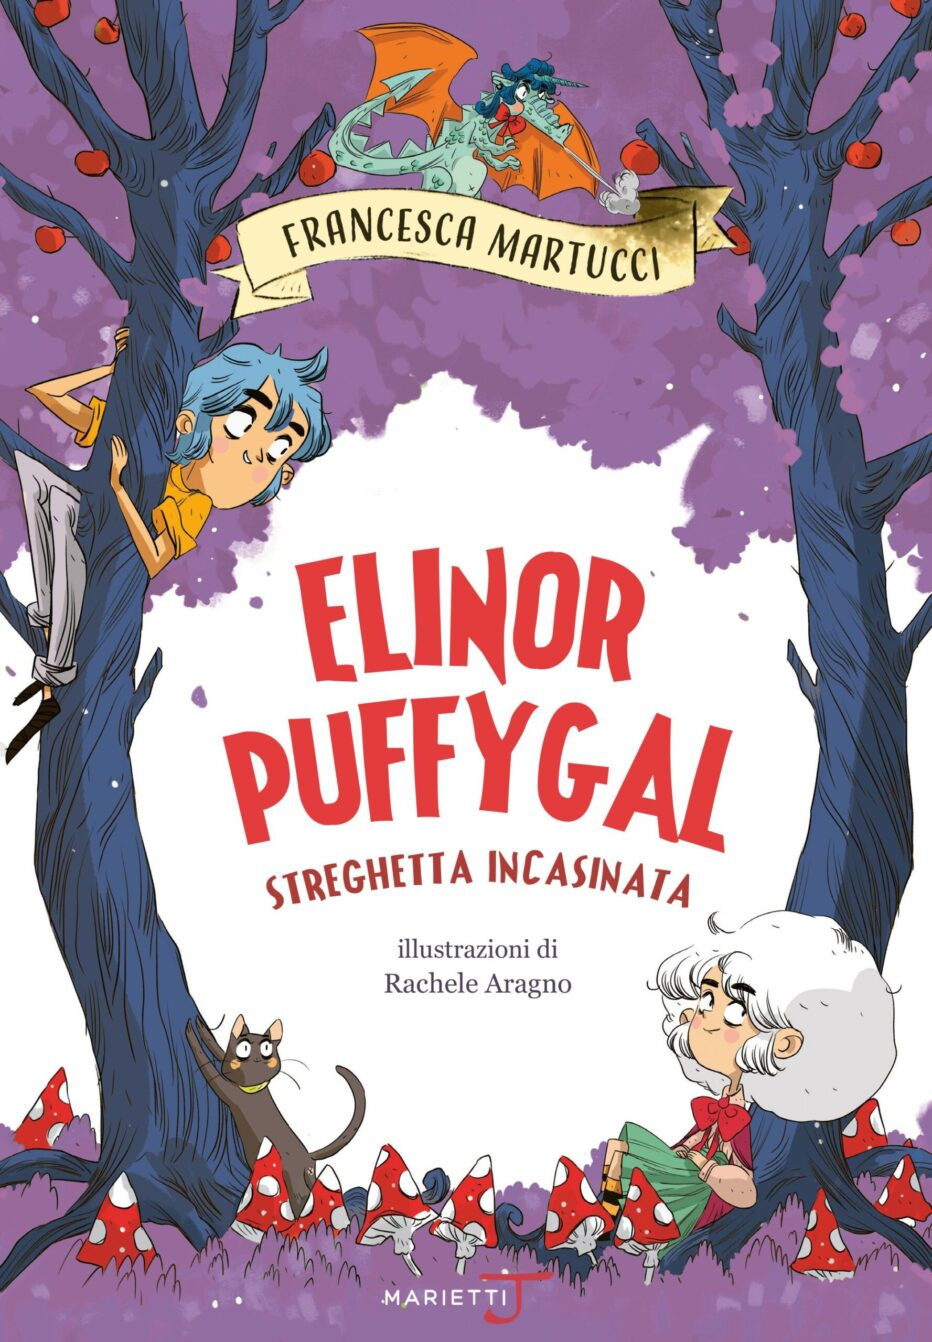 Elinor Puffygal – Streghetta incasinata